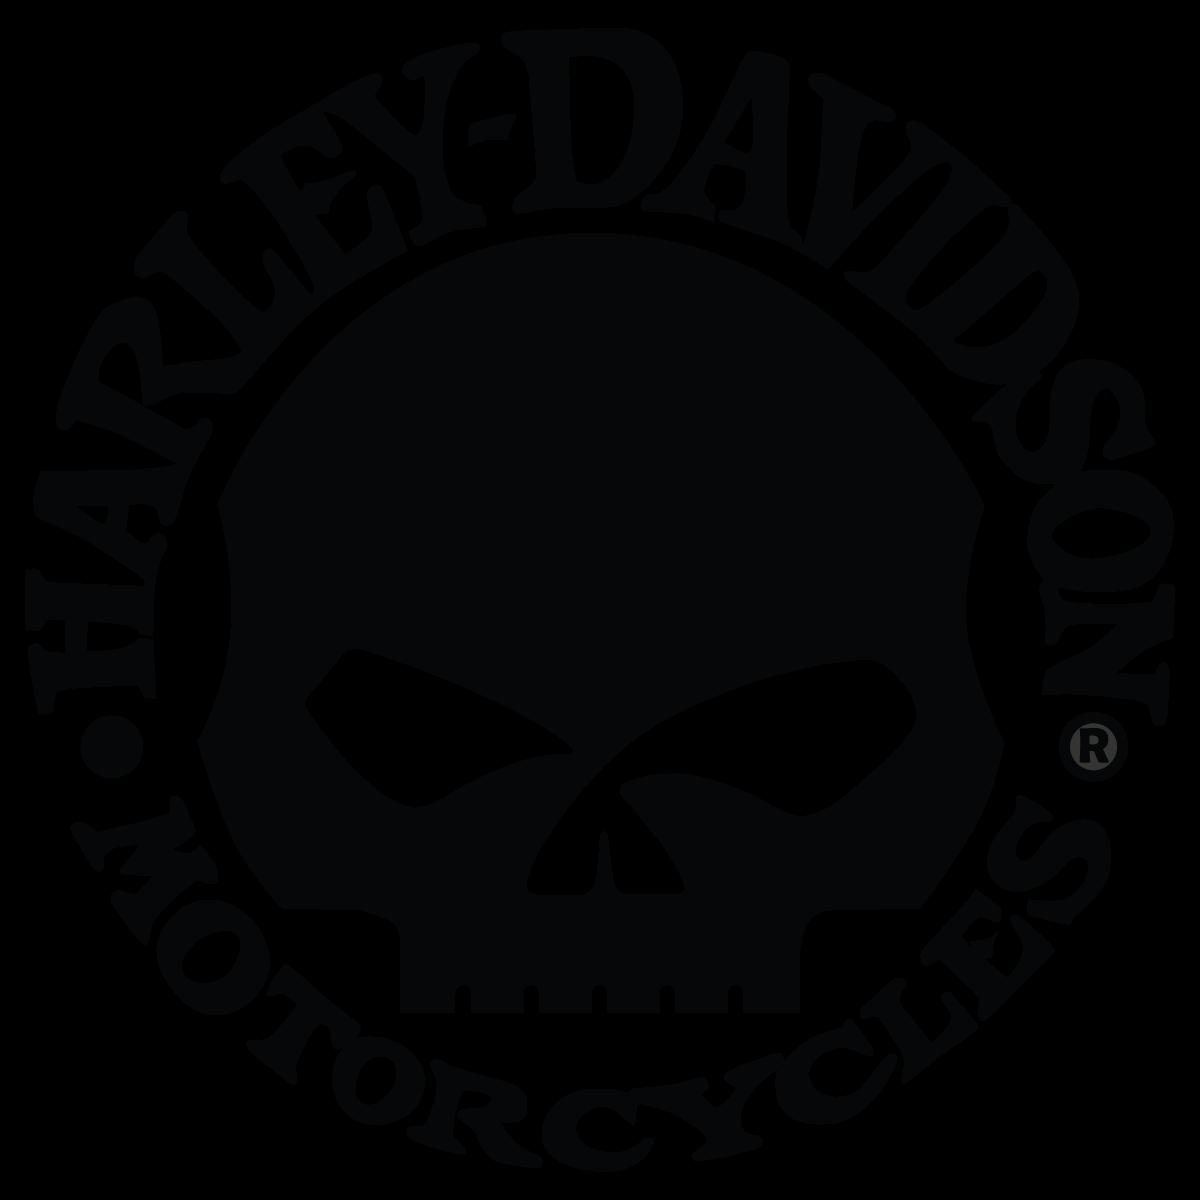 1200x1200 Harley Davidson Motor Cycles Skull Logo Vector Free Vector